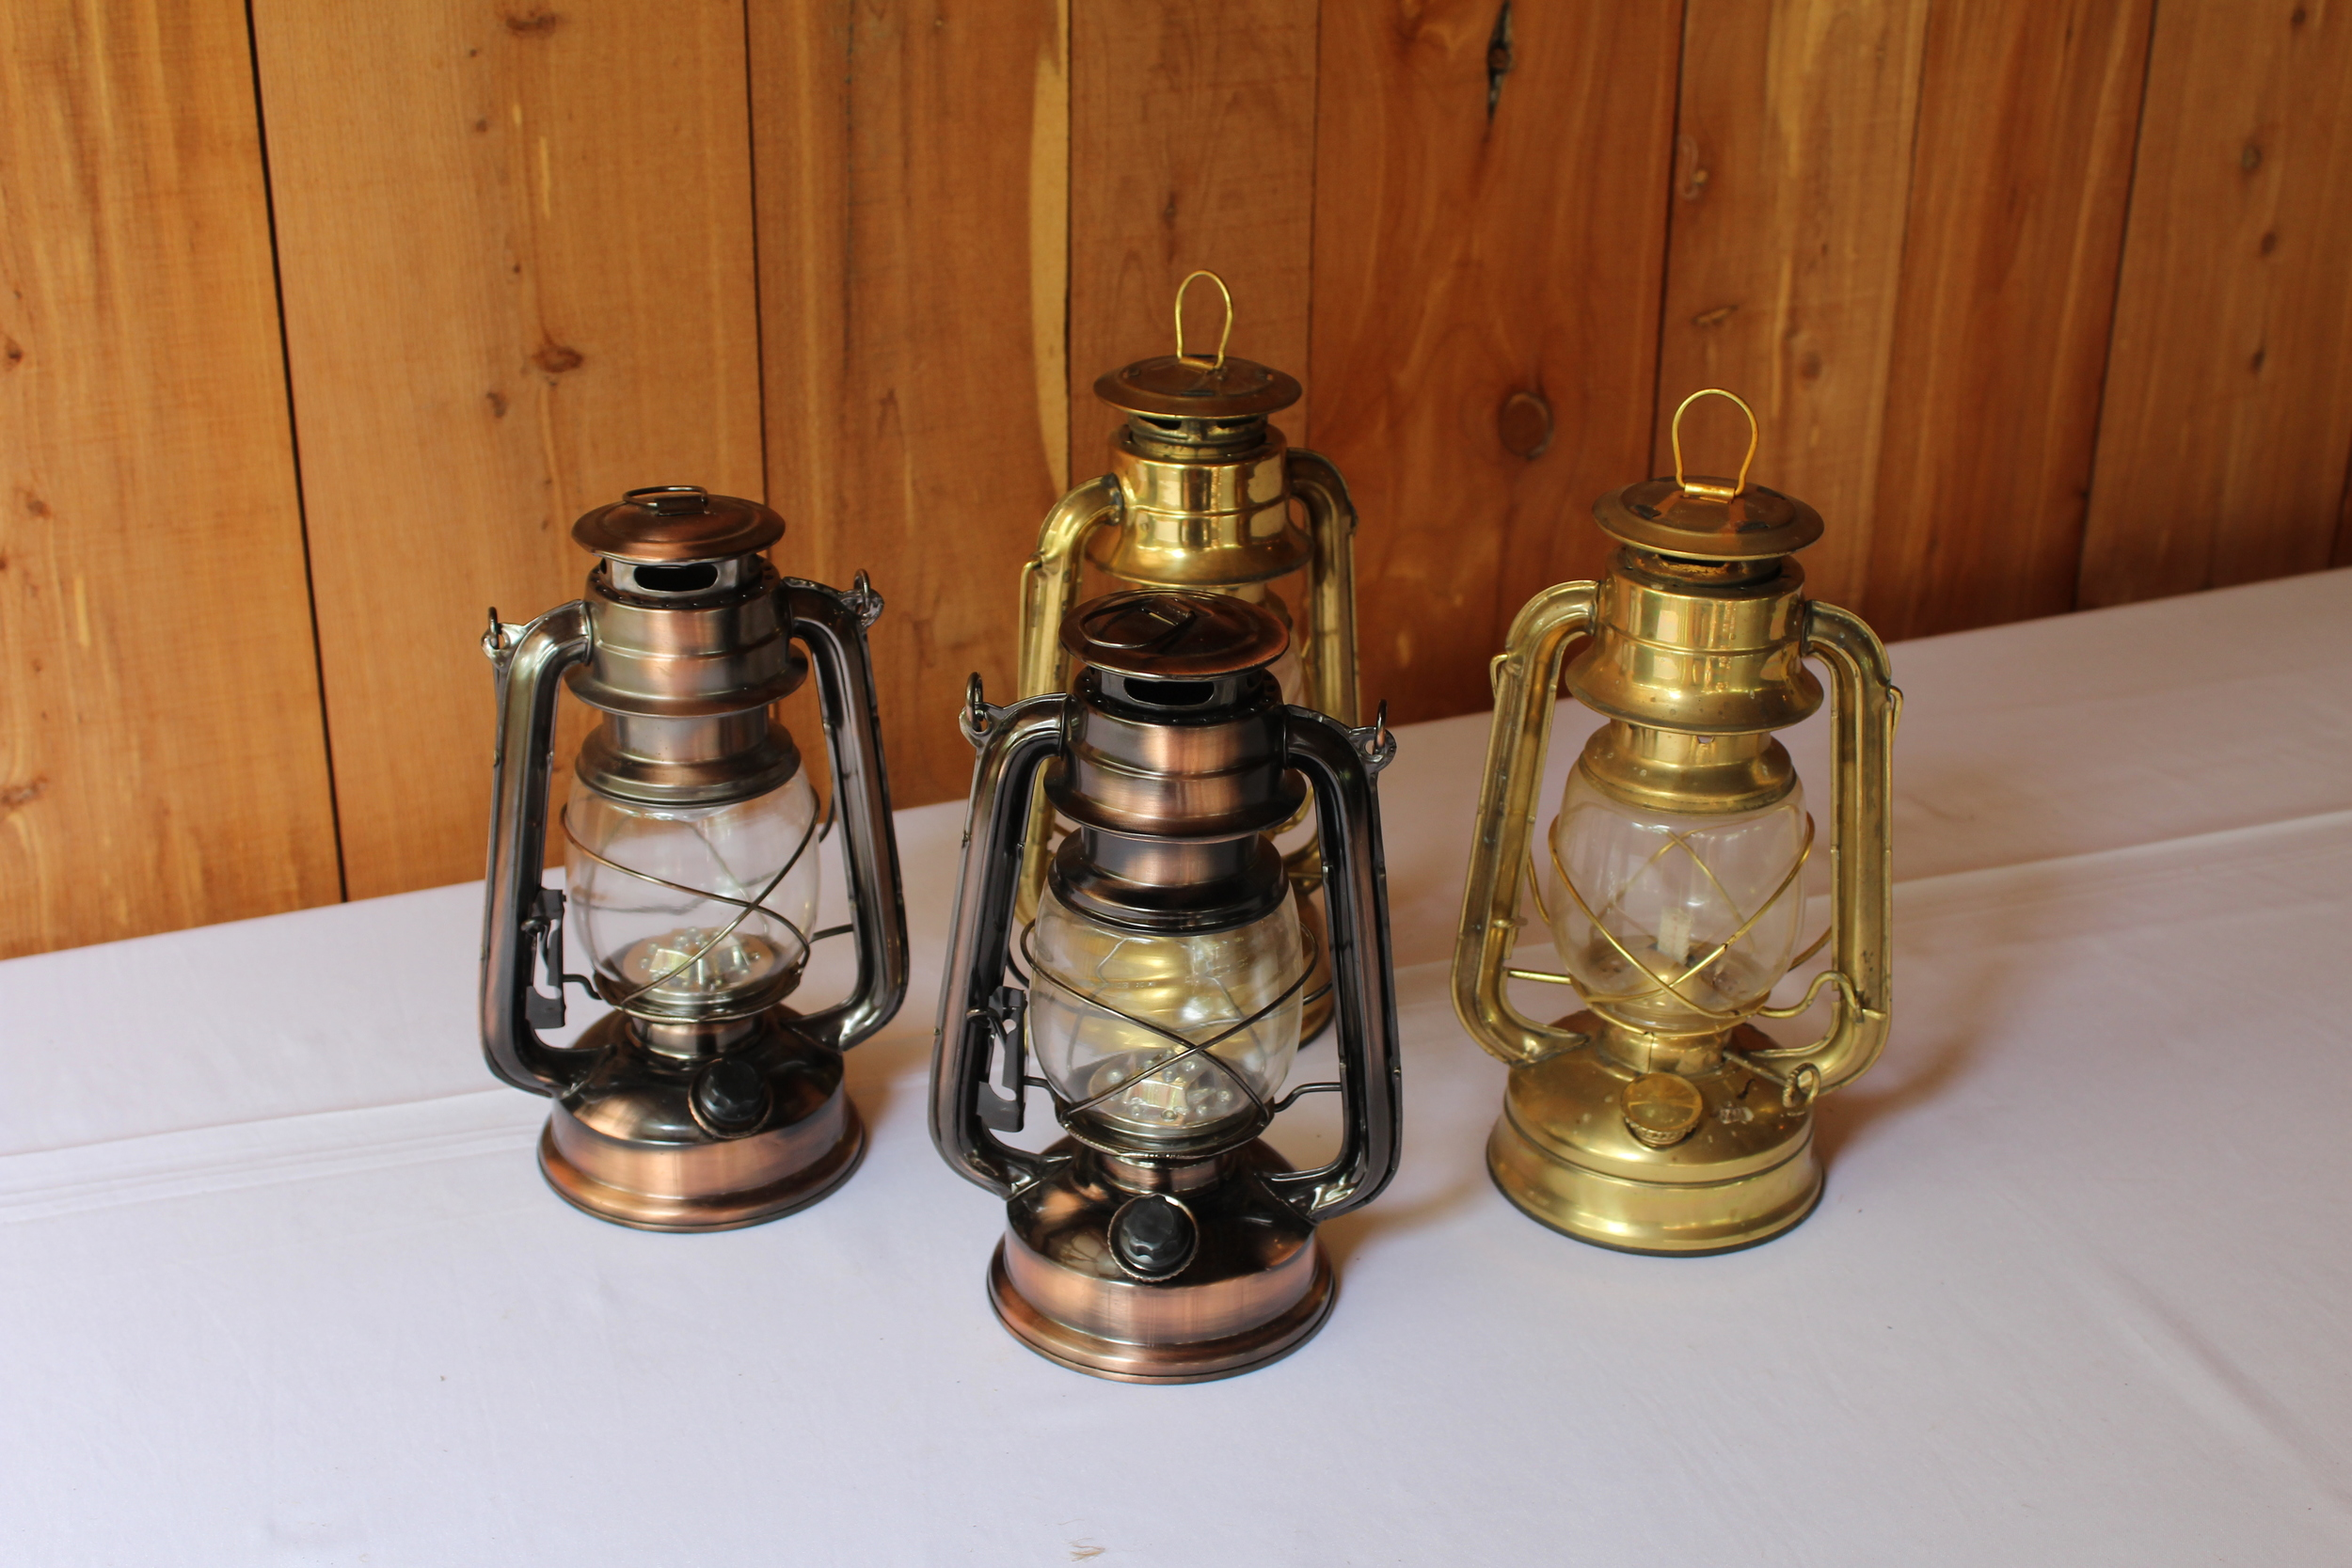 #138 - Rustic Lanterns (Qty 4)